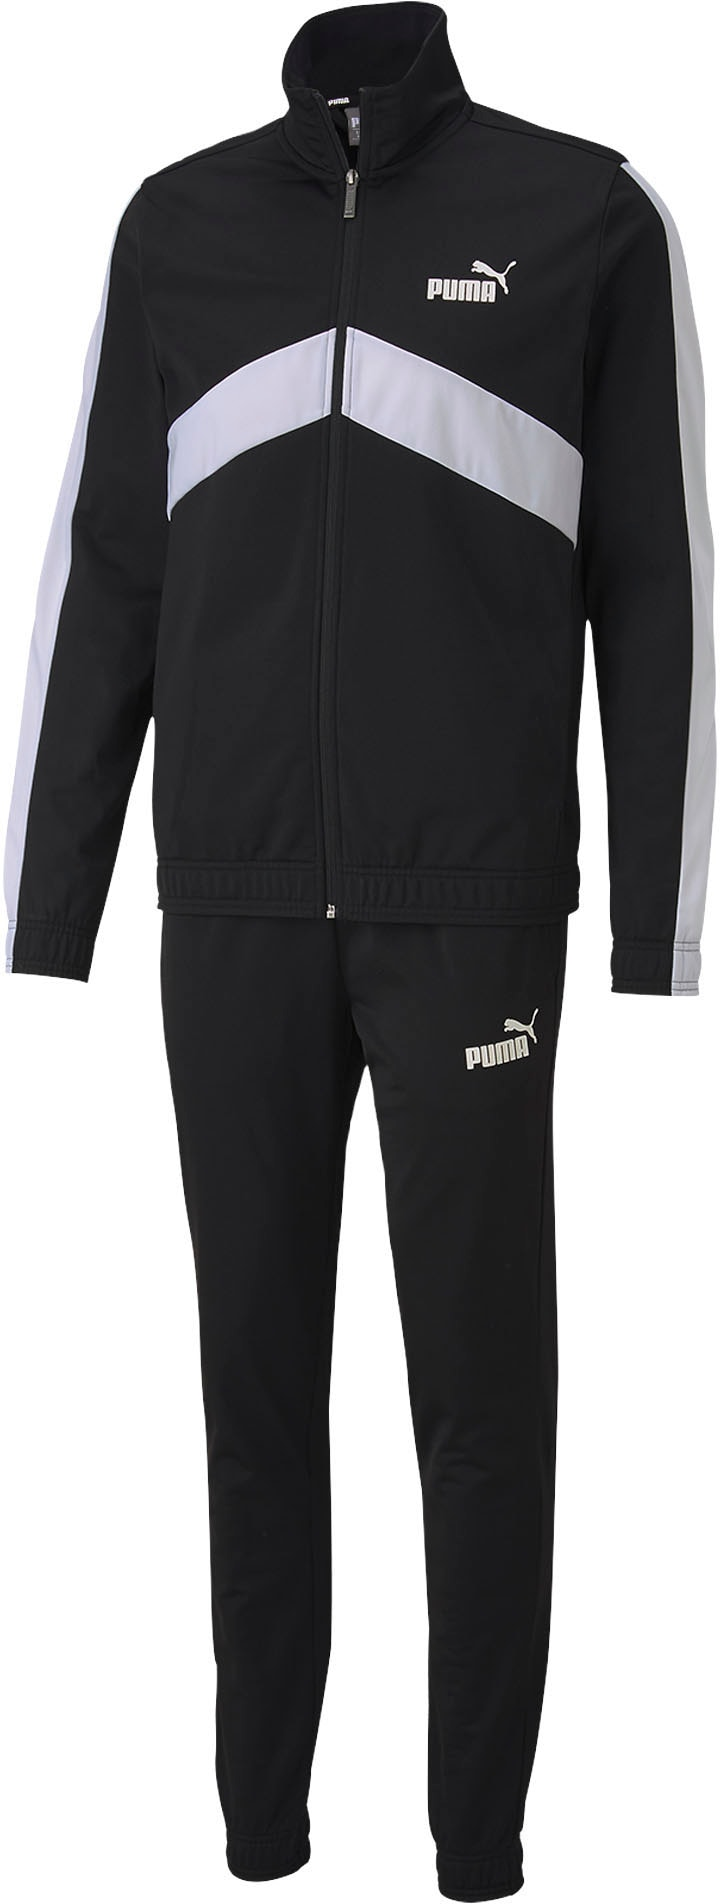 PUMA Trainingsanzug Classic Tricot Suit (Set, 2 tlg.) schwarz Herren Trainingsanzüge Sportbekleidung